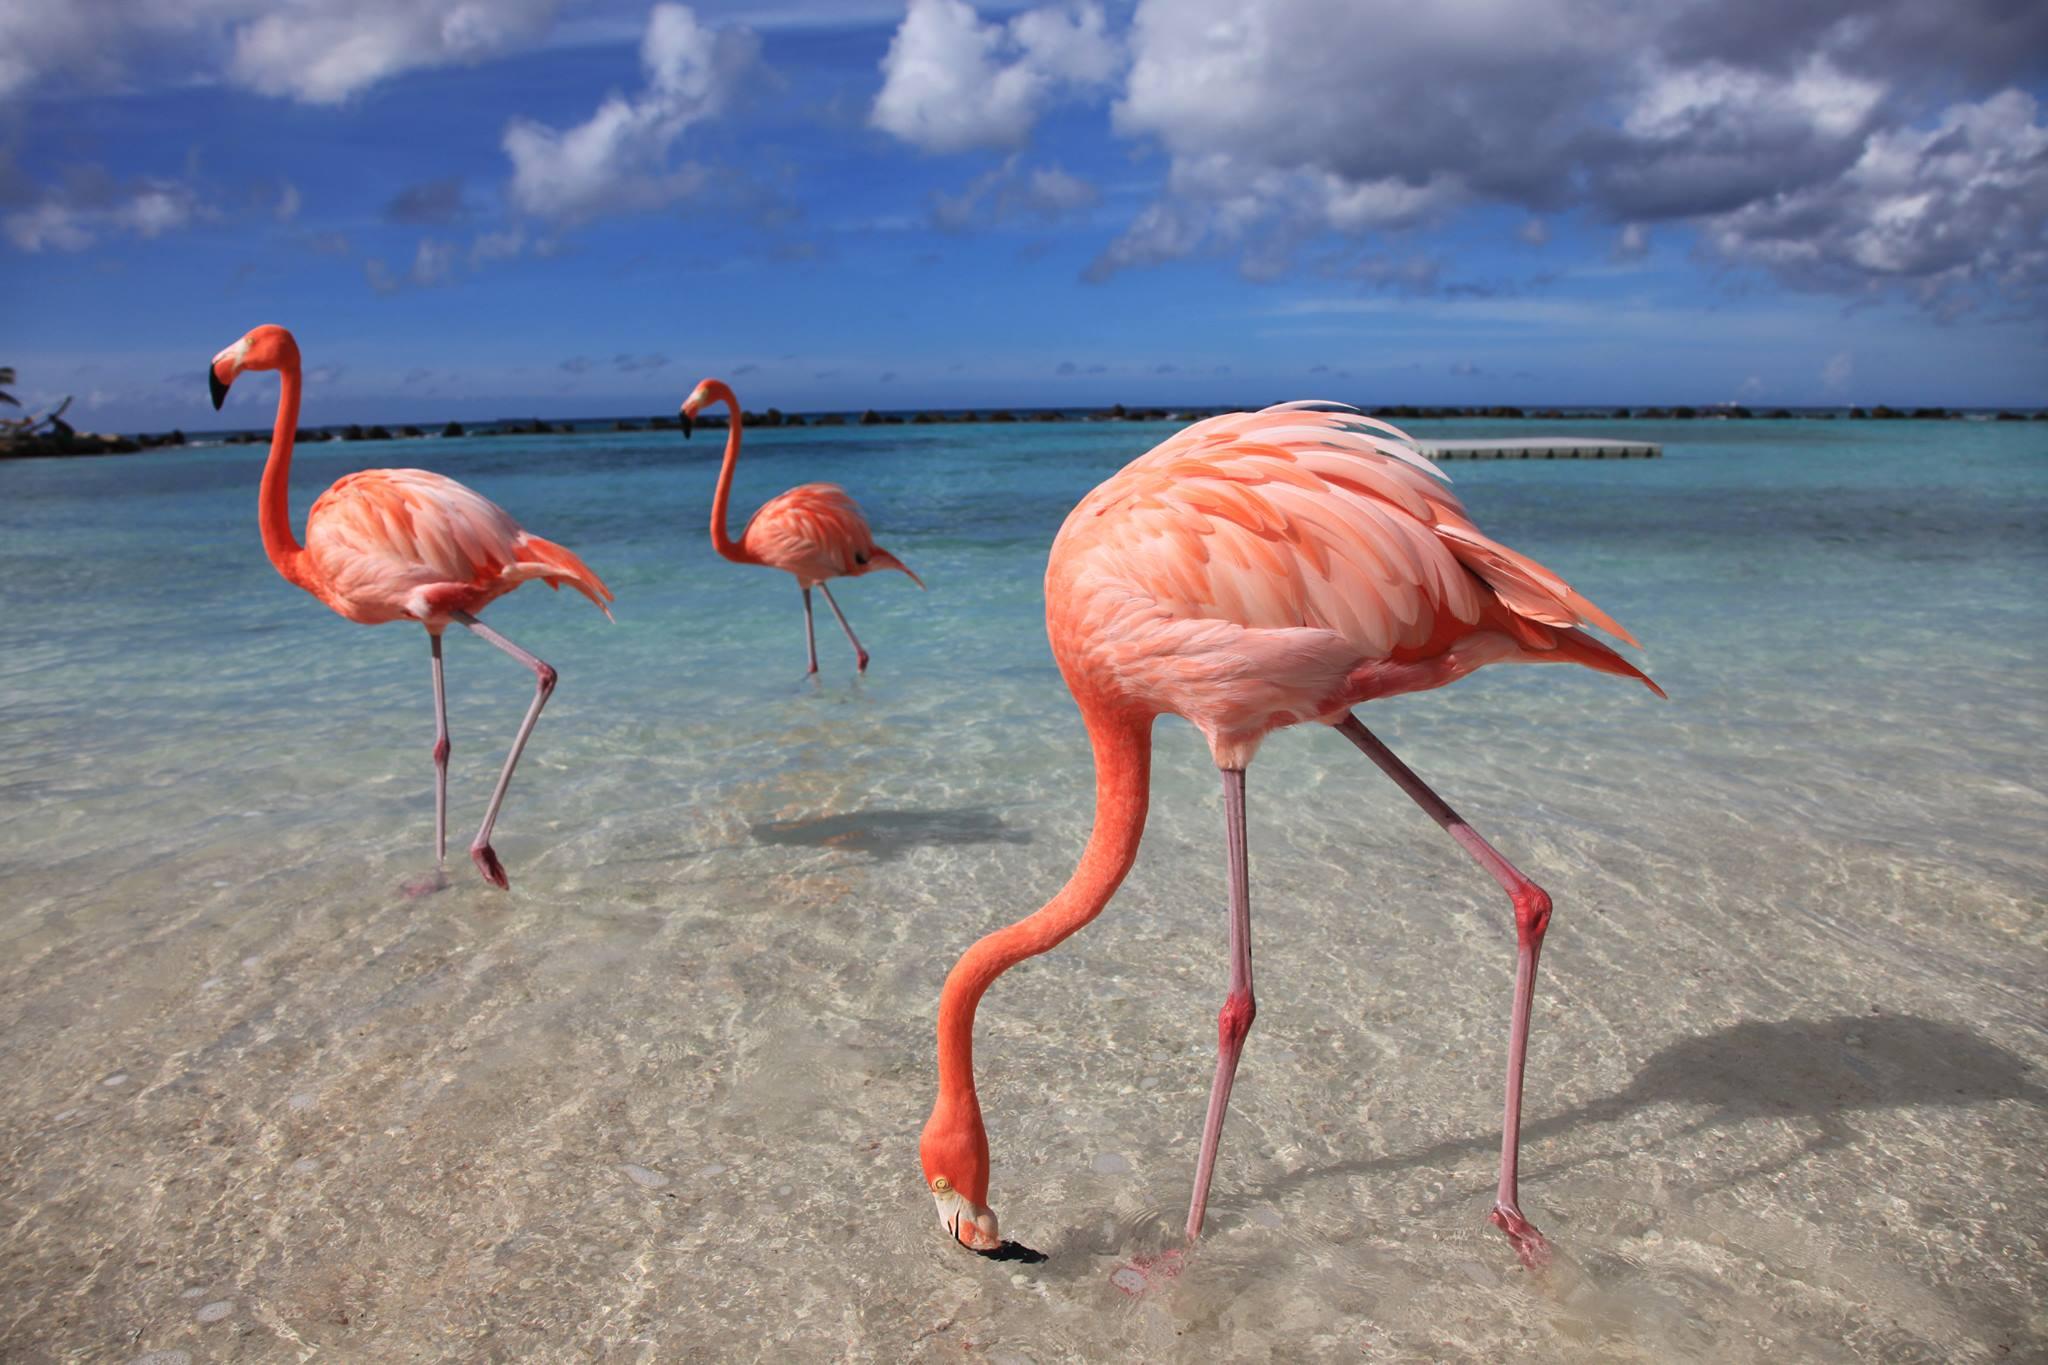 скорпионами фламинго на джербе фото отзывы невероятно